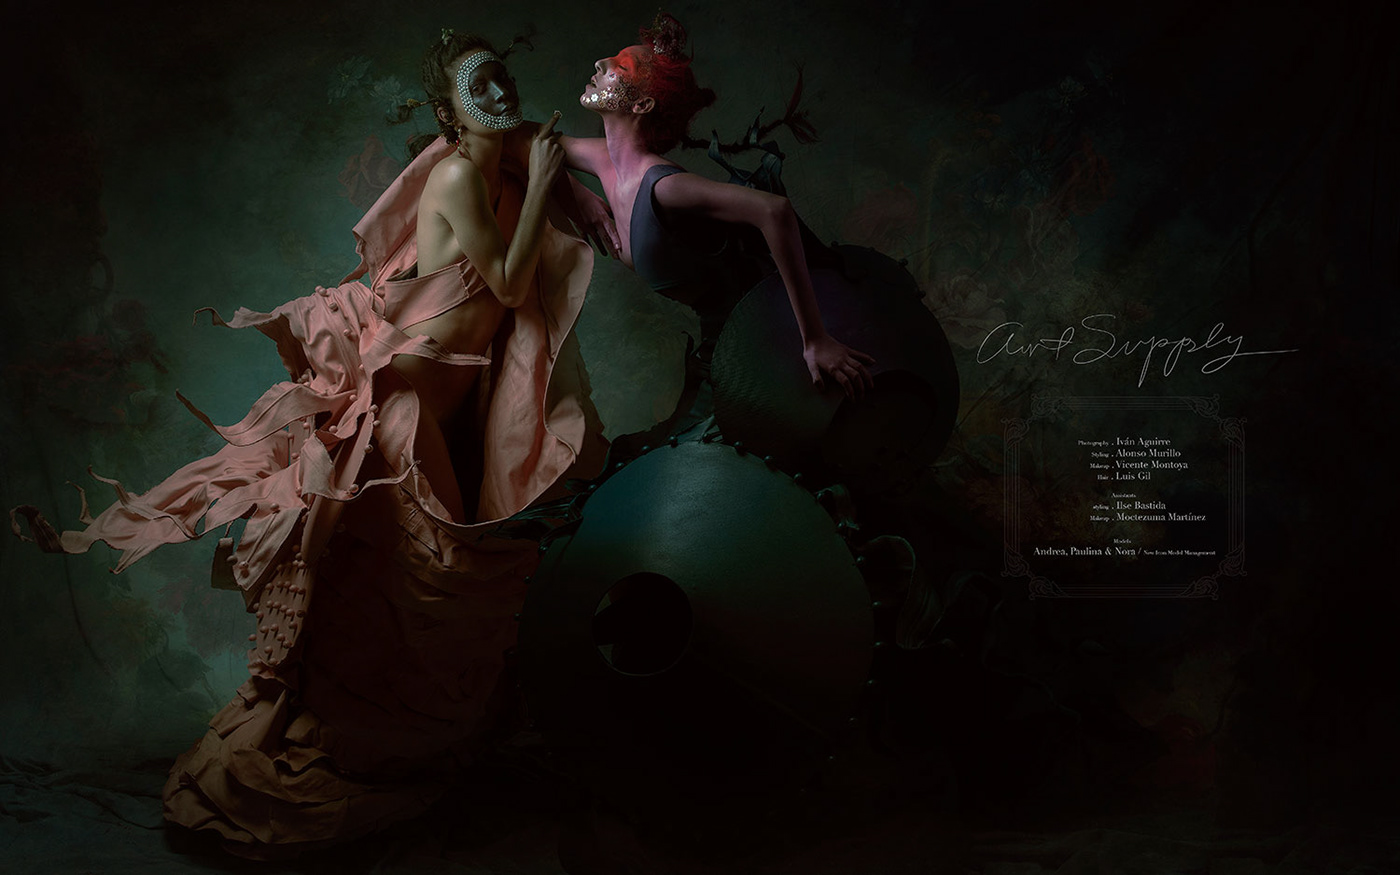 Art Supply для FLESH MAGAZINE / фото Iván Aguirre